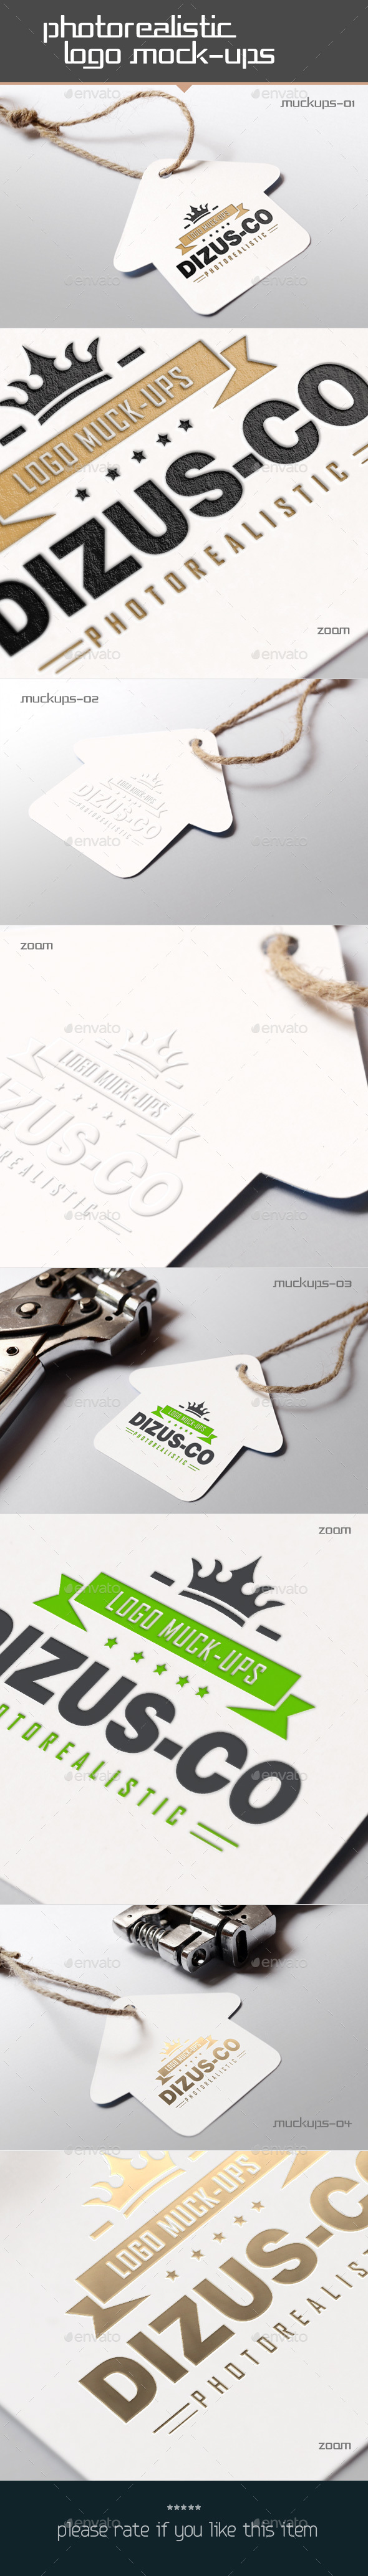 Photorealistic Logo Mockups